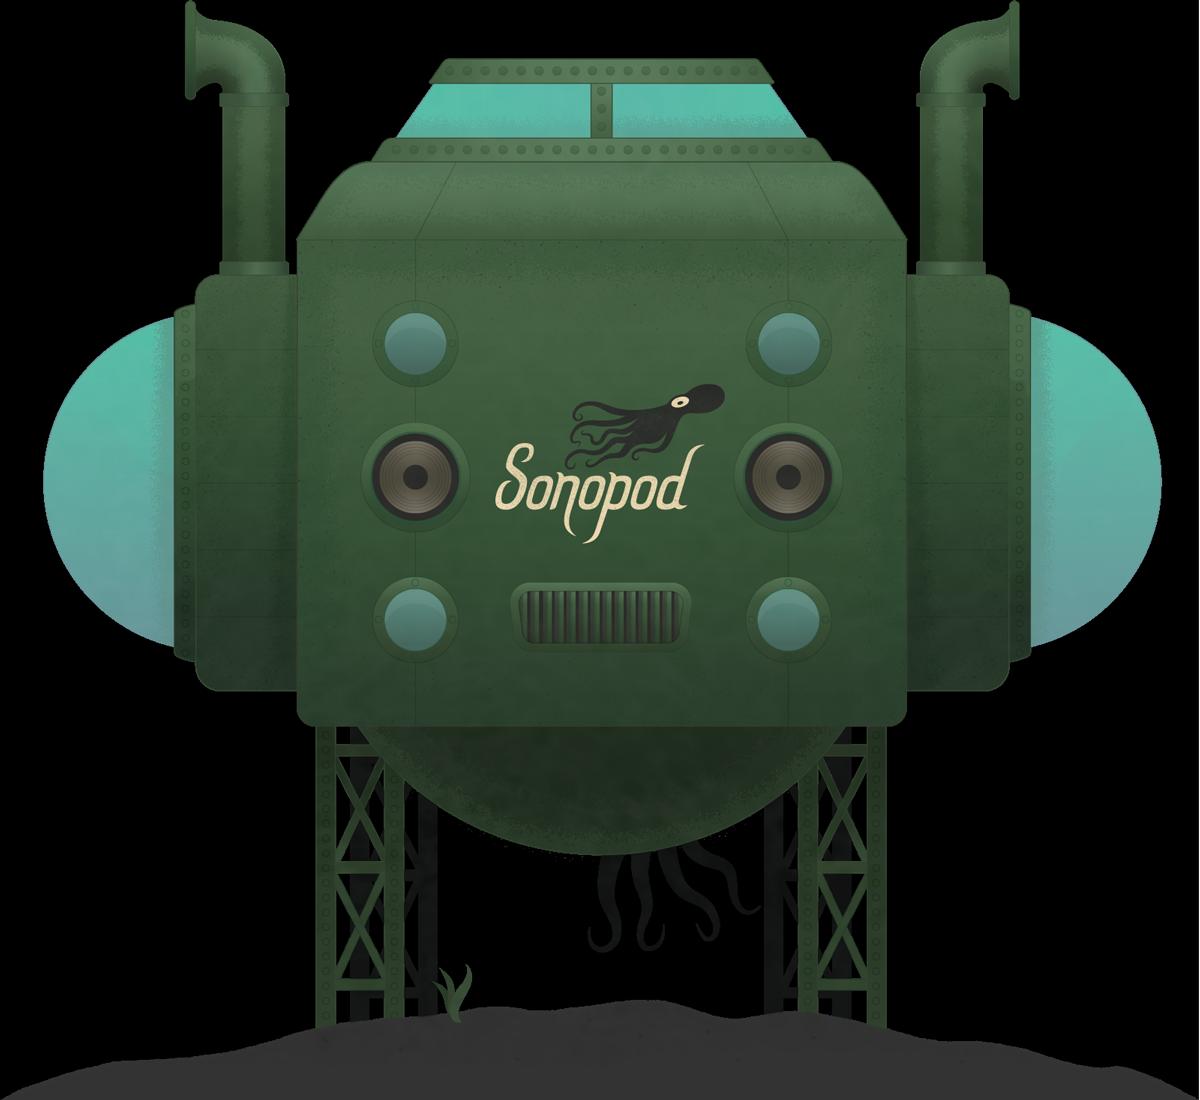 Sonopod_Site_Studio_R.png